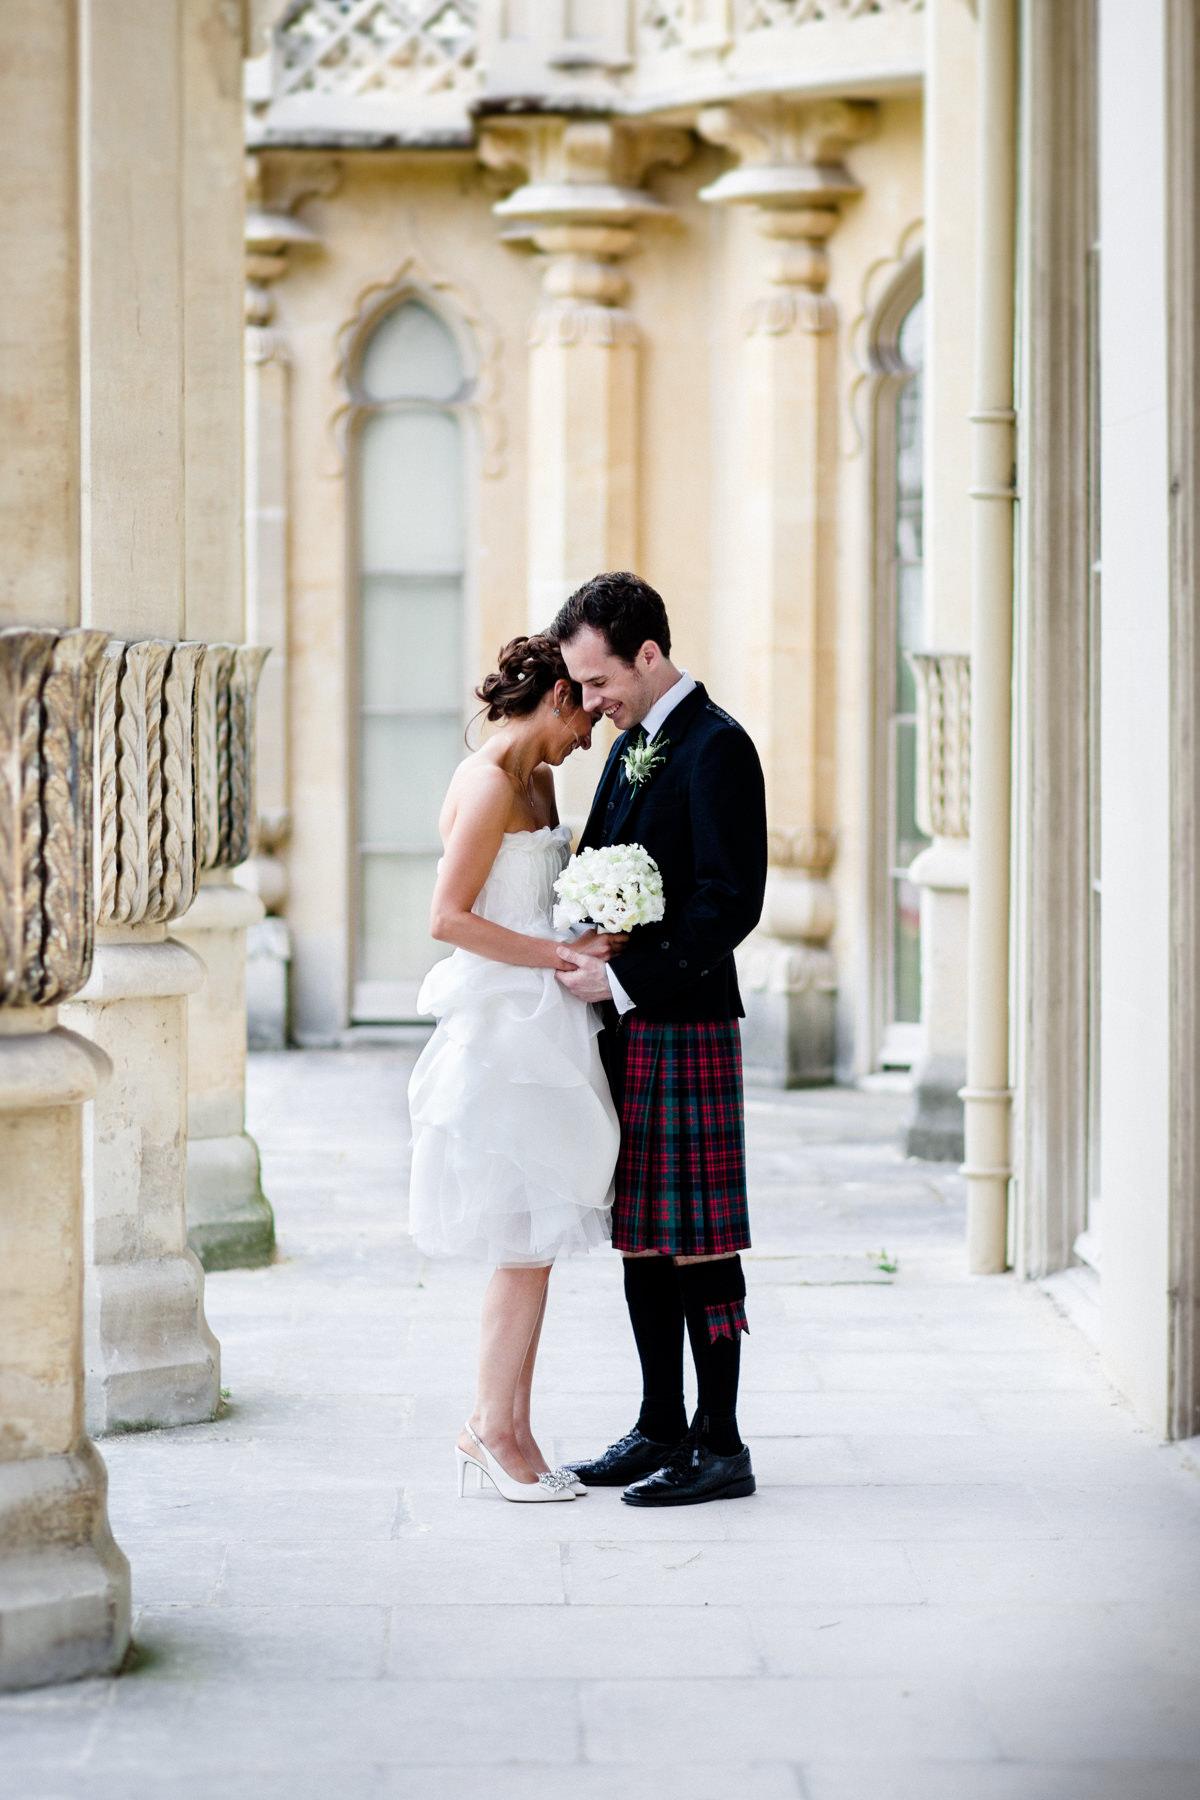 Royal Pavilion wedding Brighton CN Michael Stanton Photography 15